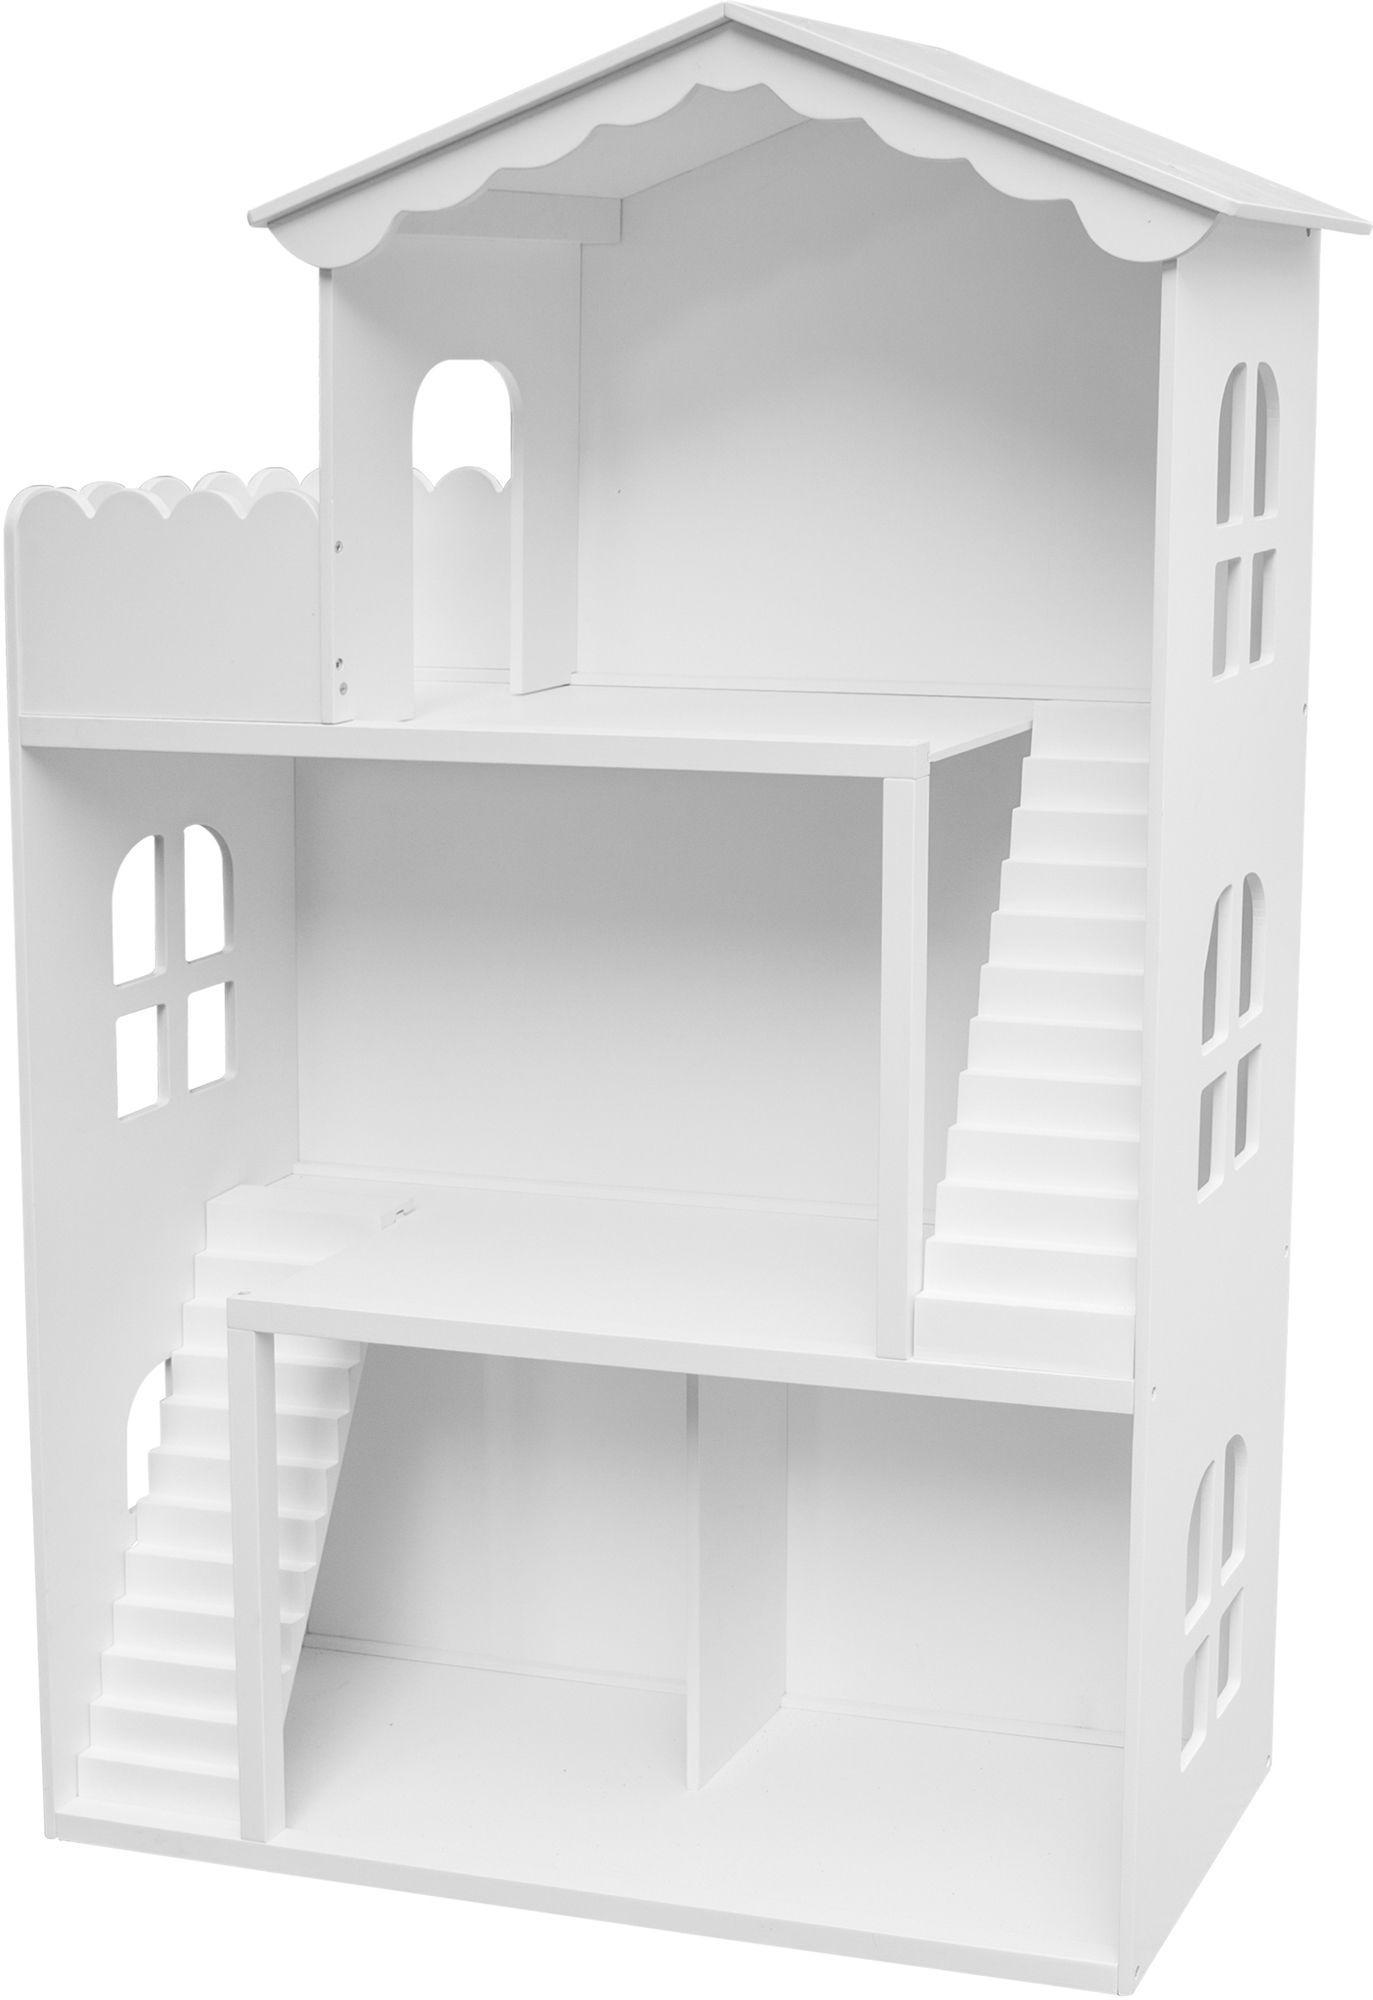 Kaufen Cloudberry Castle Puppenhaus Bücherregal | Jollyroom